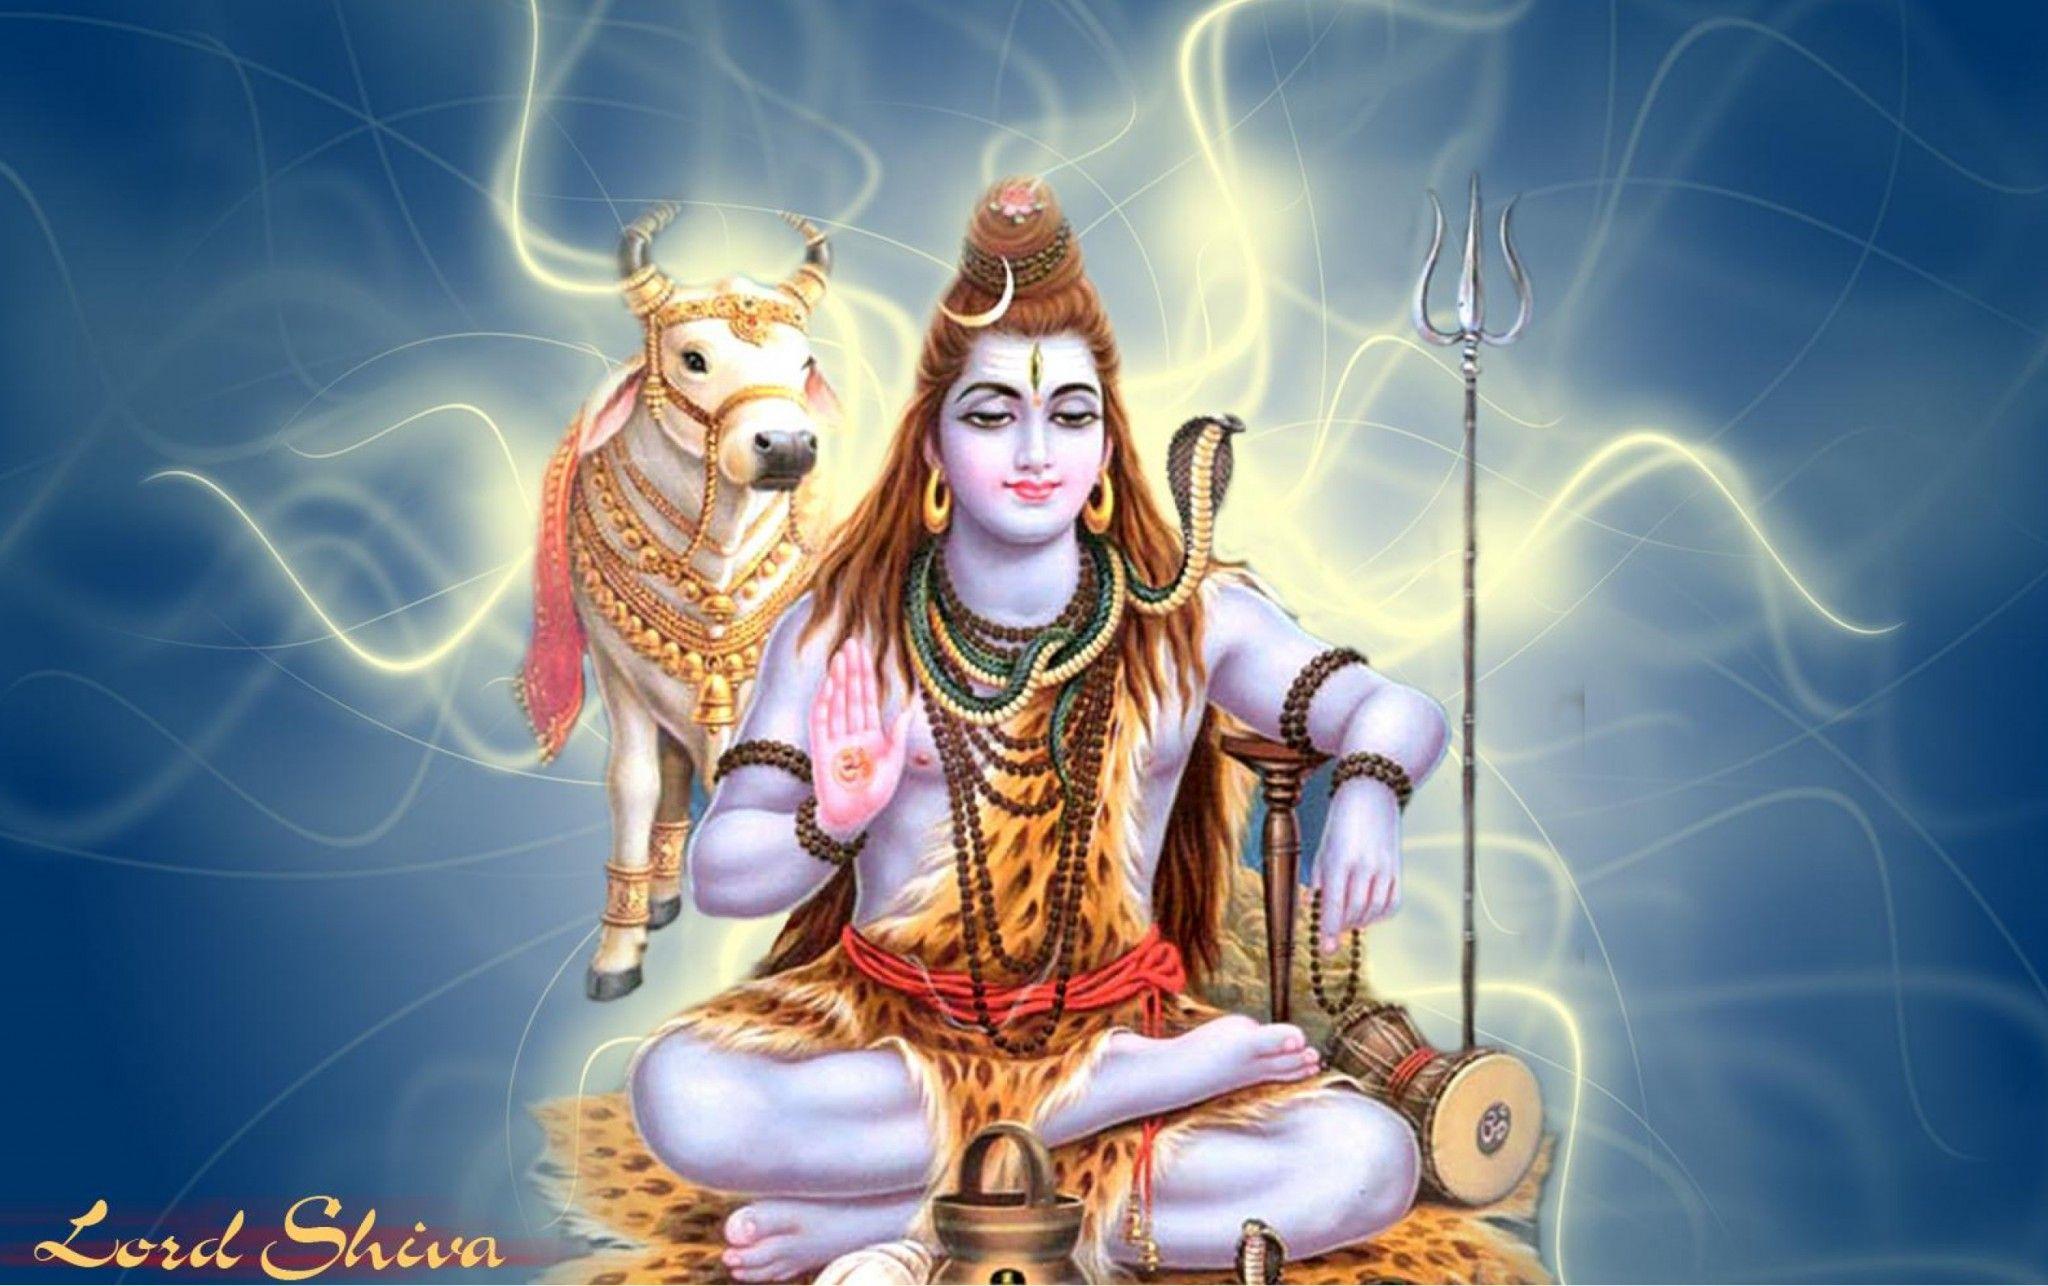 Hd wallpaper shiva - Bhagwan Shiv Shankar Wallpapers Hd Images Photos Free Download